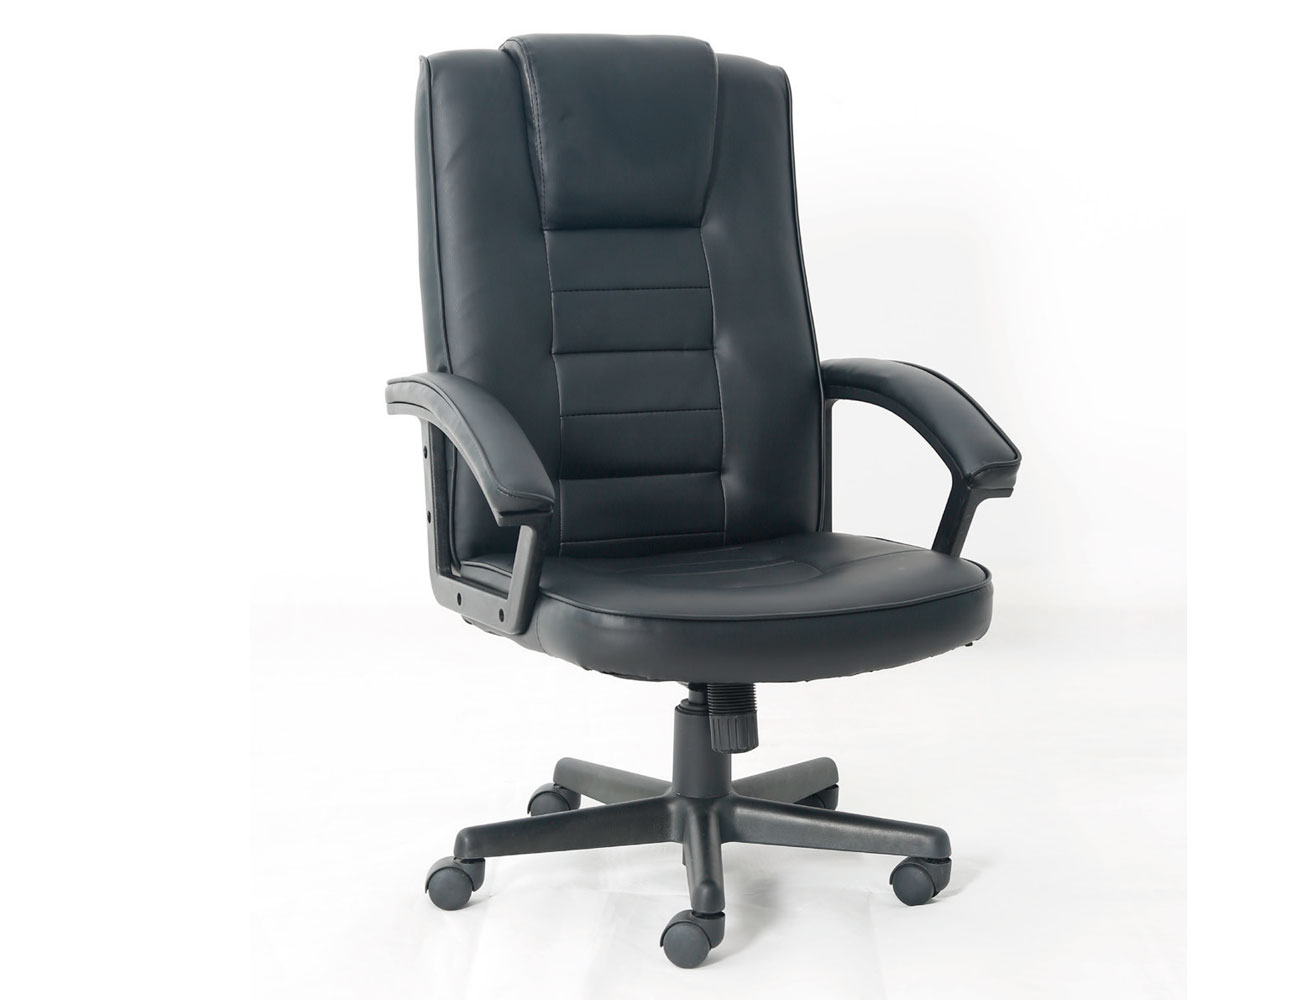 Silla de oficina con reposa brazos y respaldo alto en for Sillas de oficina con ruedas